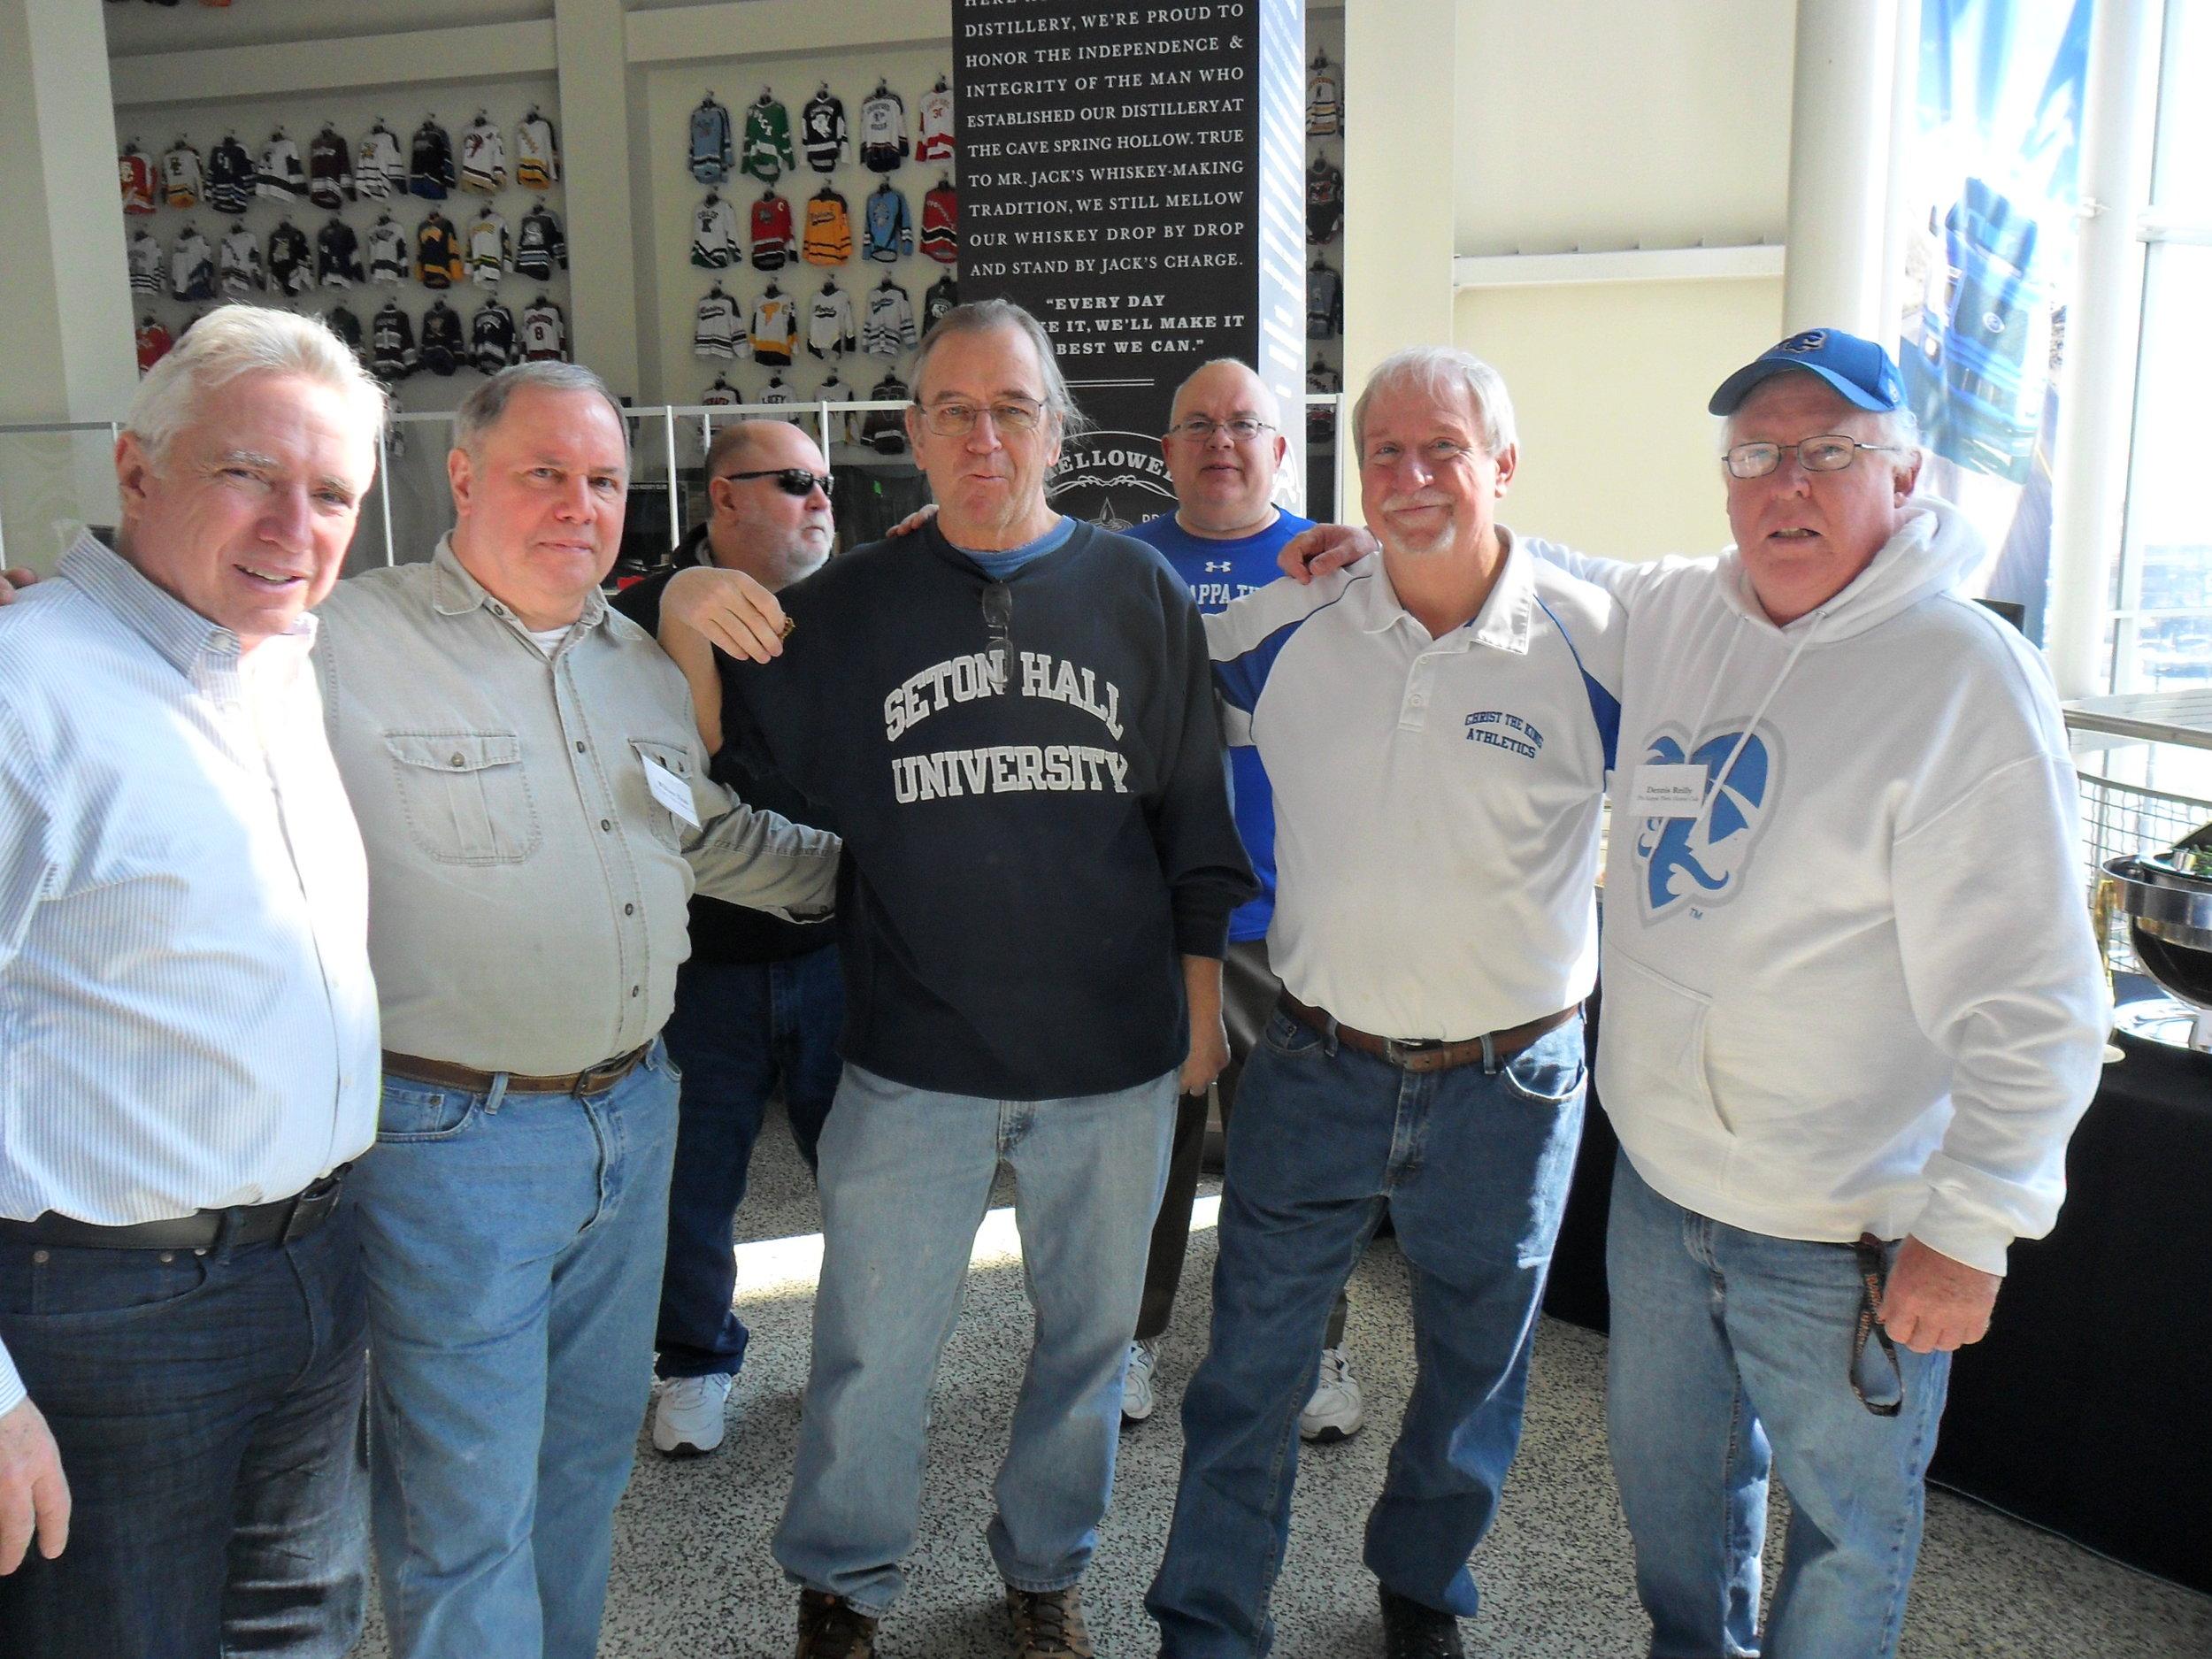 Larry DePalma, Bill Trub, Rich Holden, Chris Kennedy, Dennis Reilly